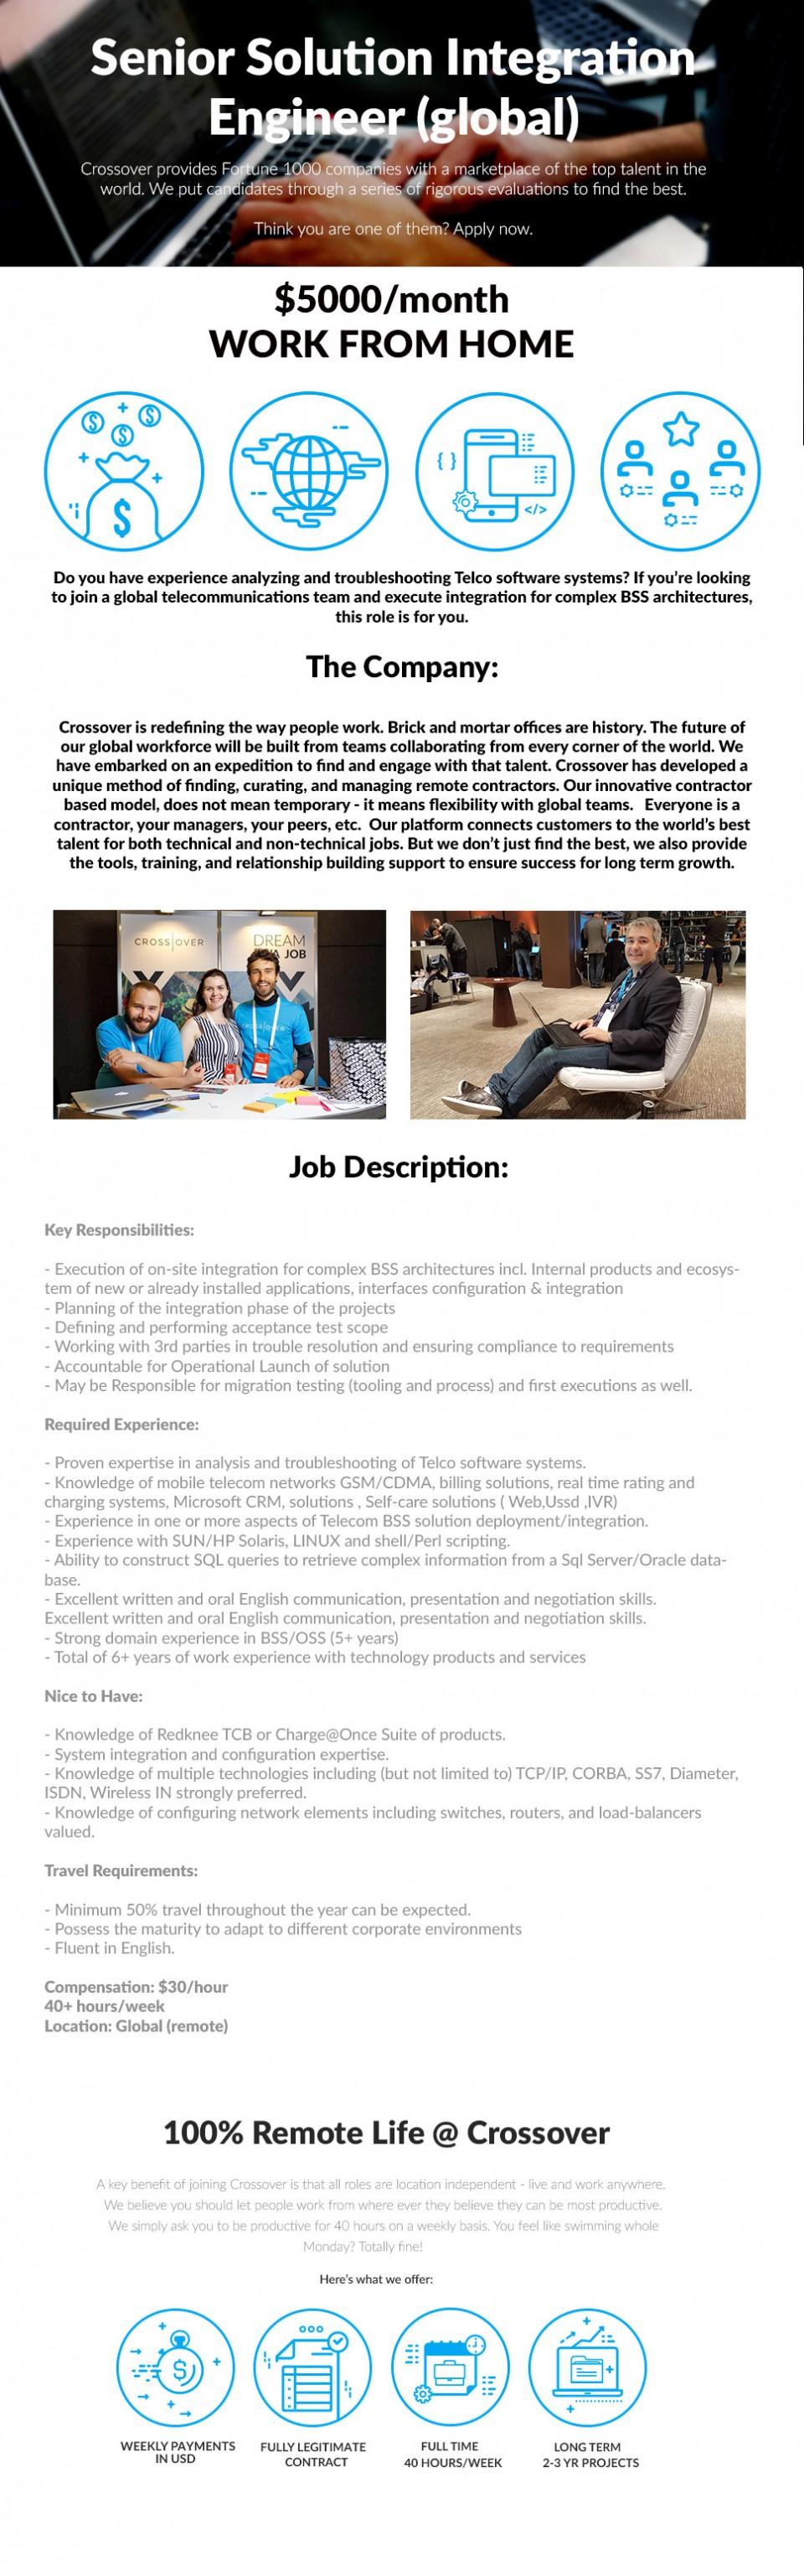 Senior Solution Integration Engineer (global) - $5000/month